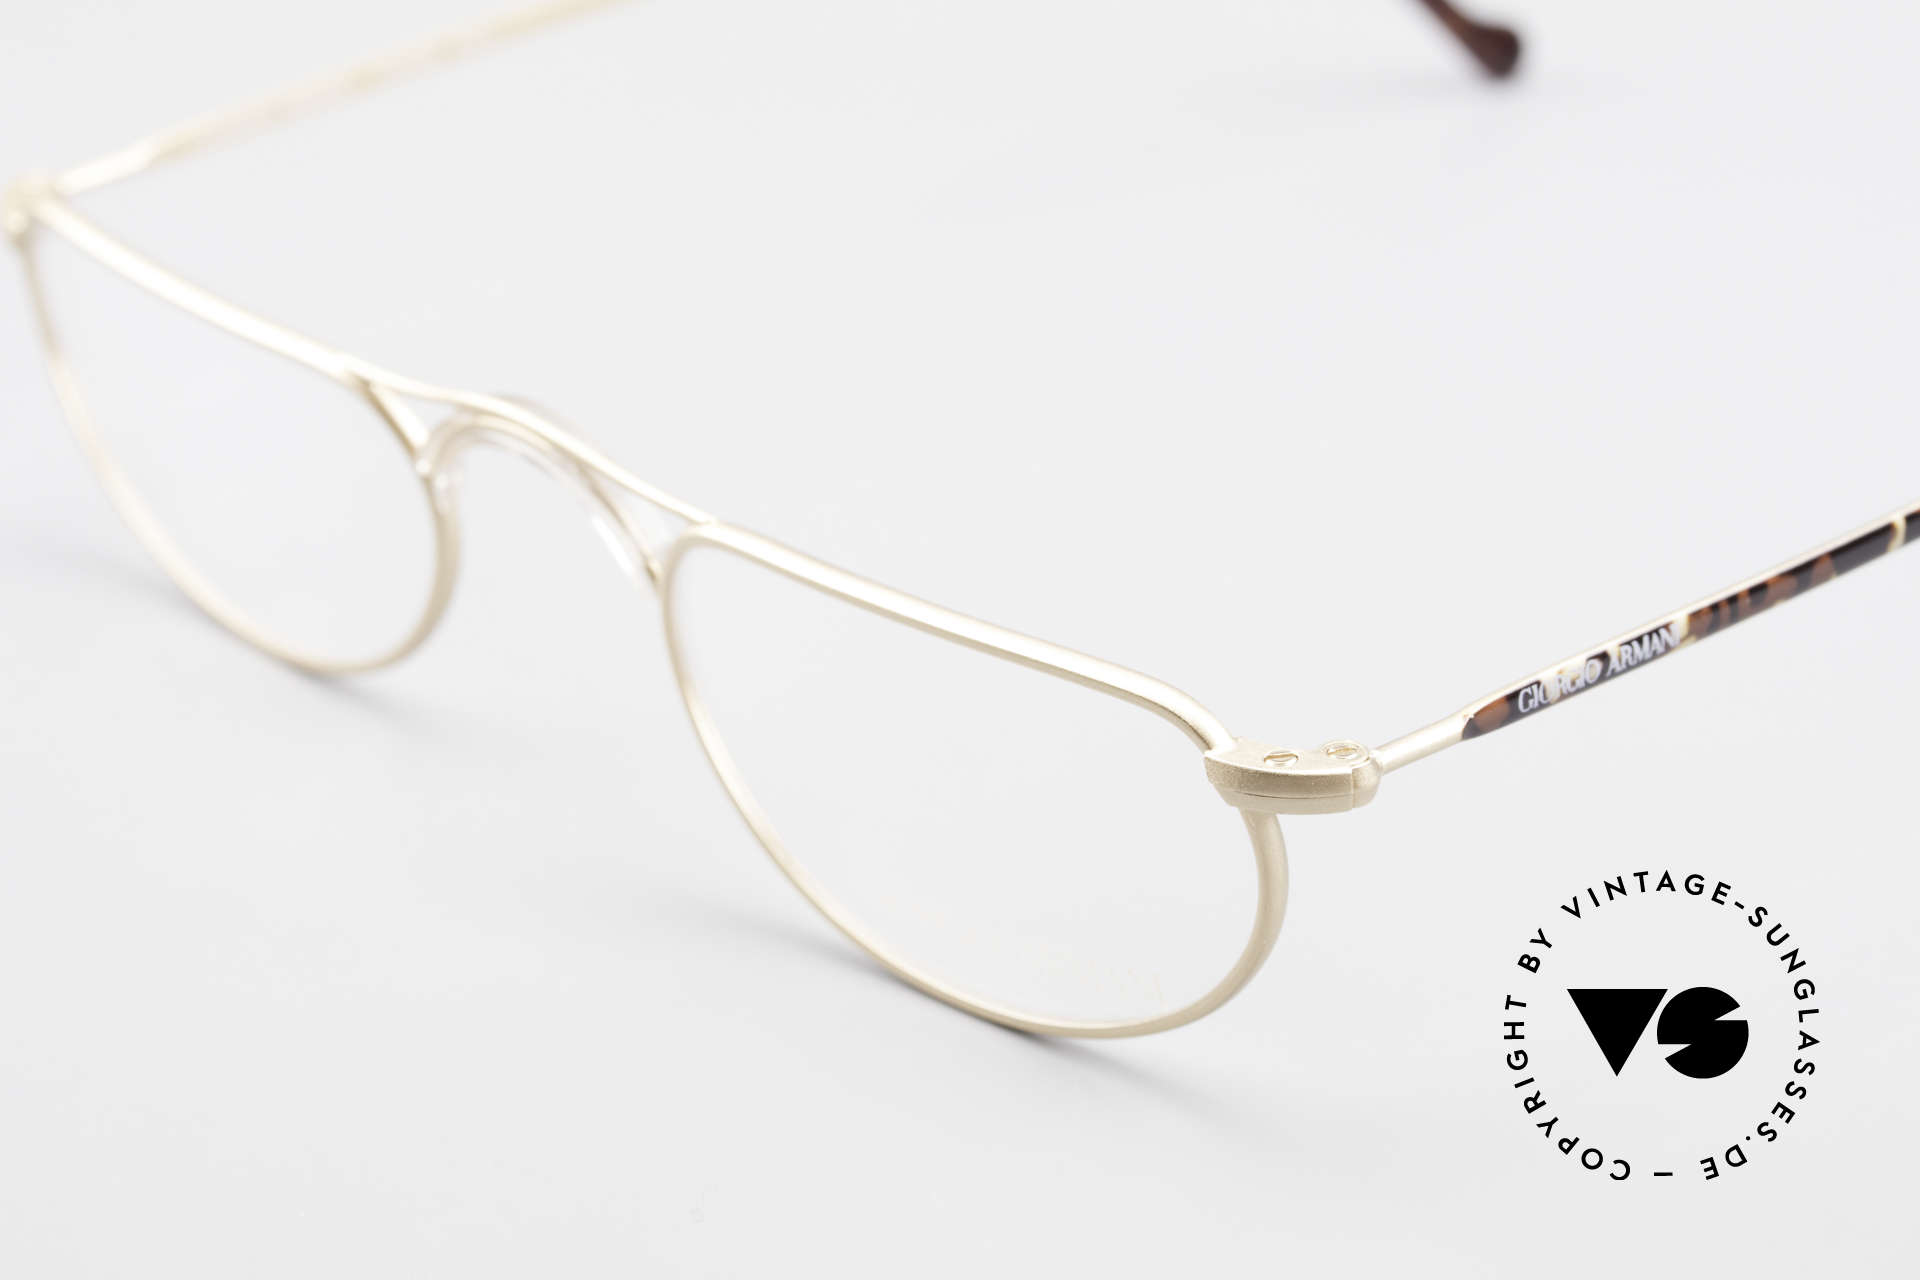 Giorgio Armani 133 Rare Old 80's Reading Glasses, NO RETRO specs, but a genuine old 80's frame!, Made for Men and Women